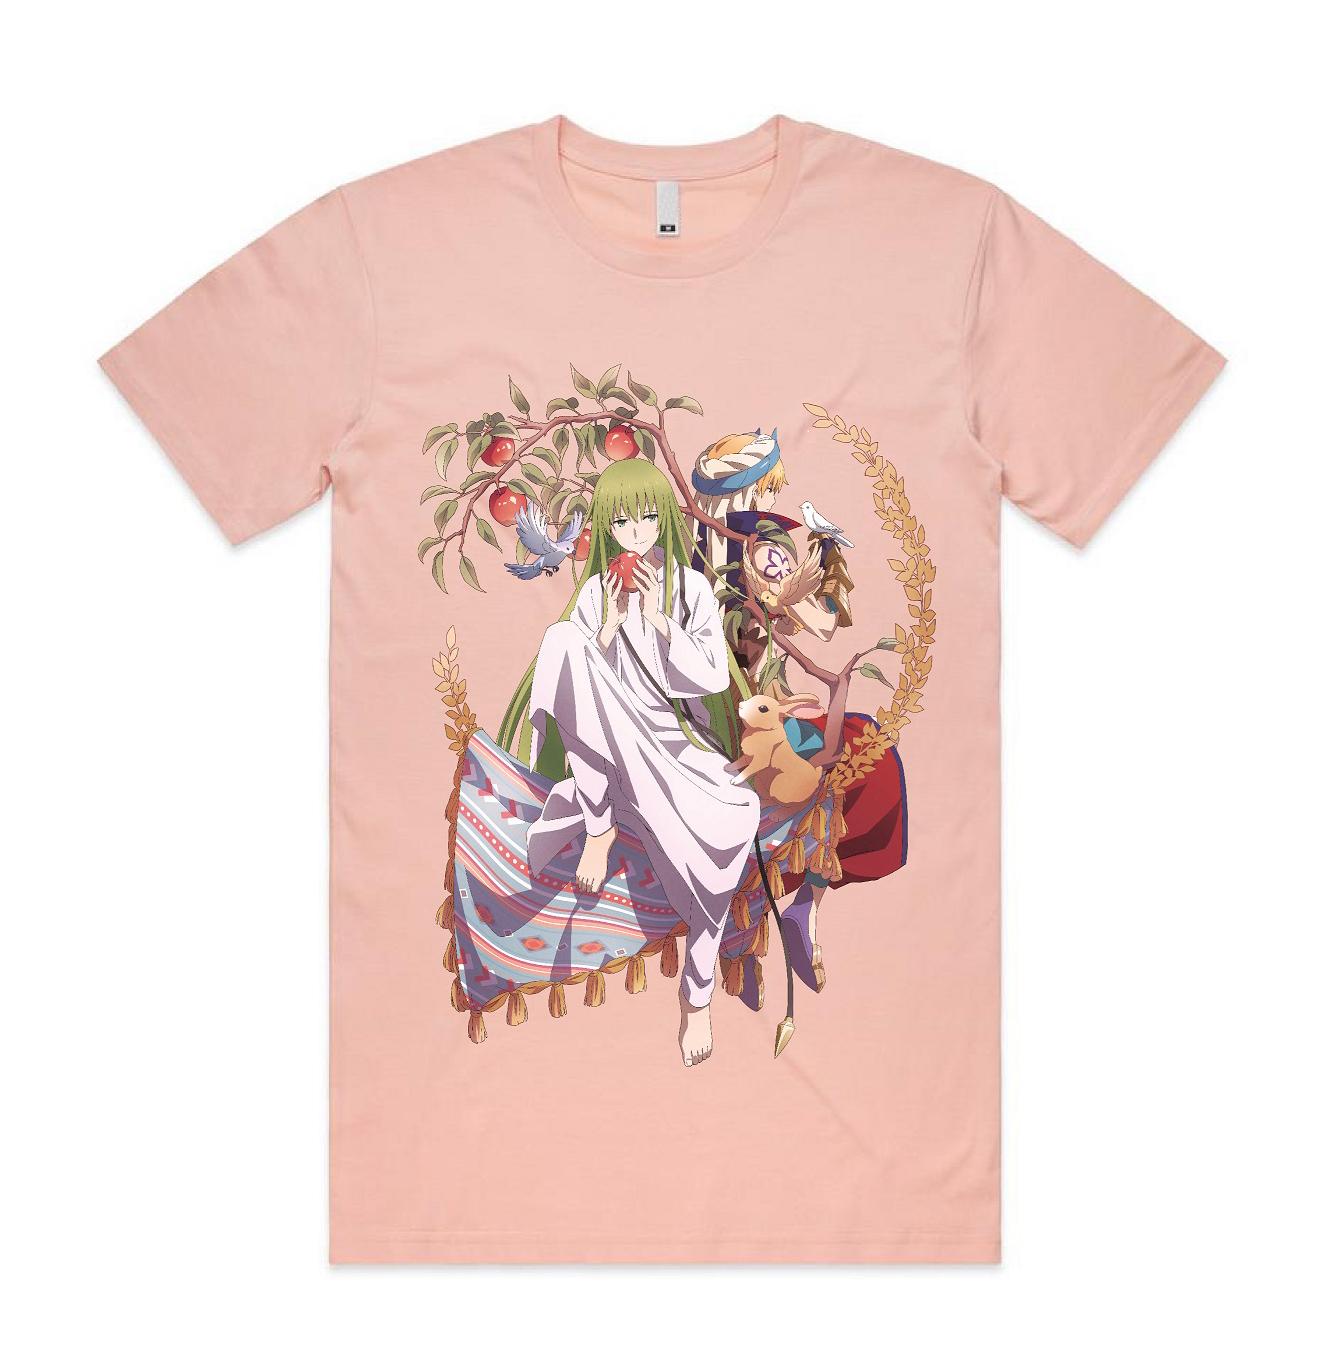 Fate/Grand Order Absolute Demonic Front Babylonia Enkidu and Gilgamesh T-shirt M